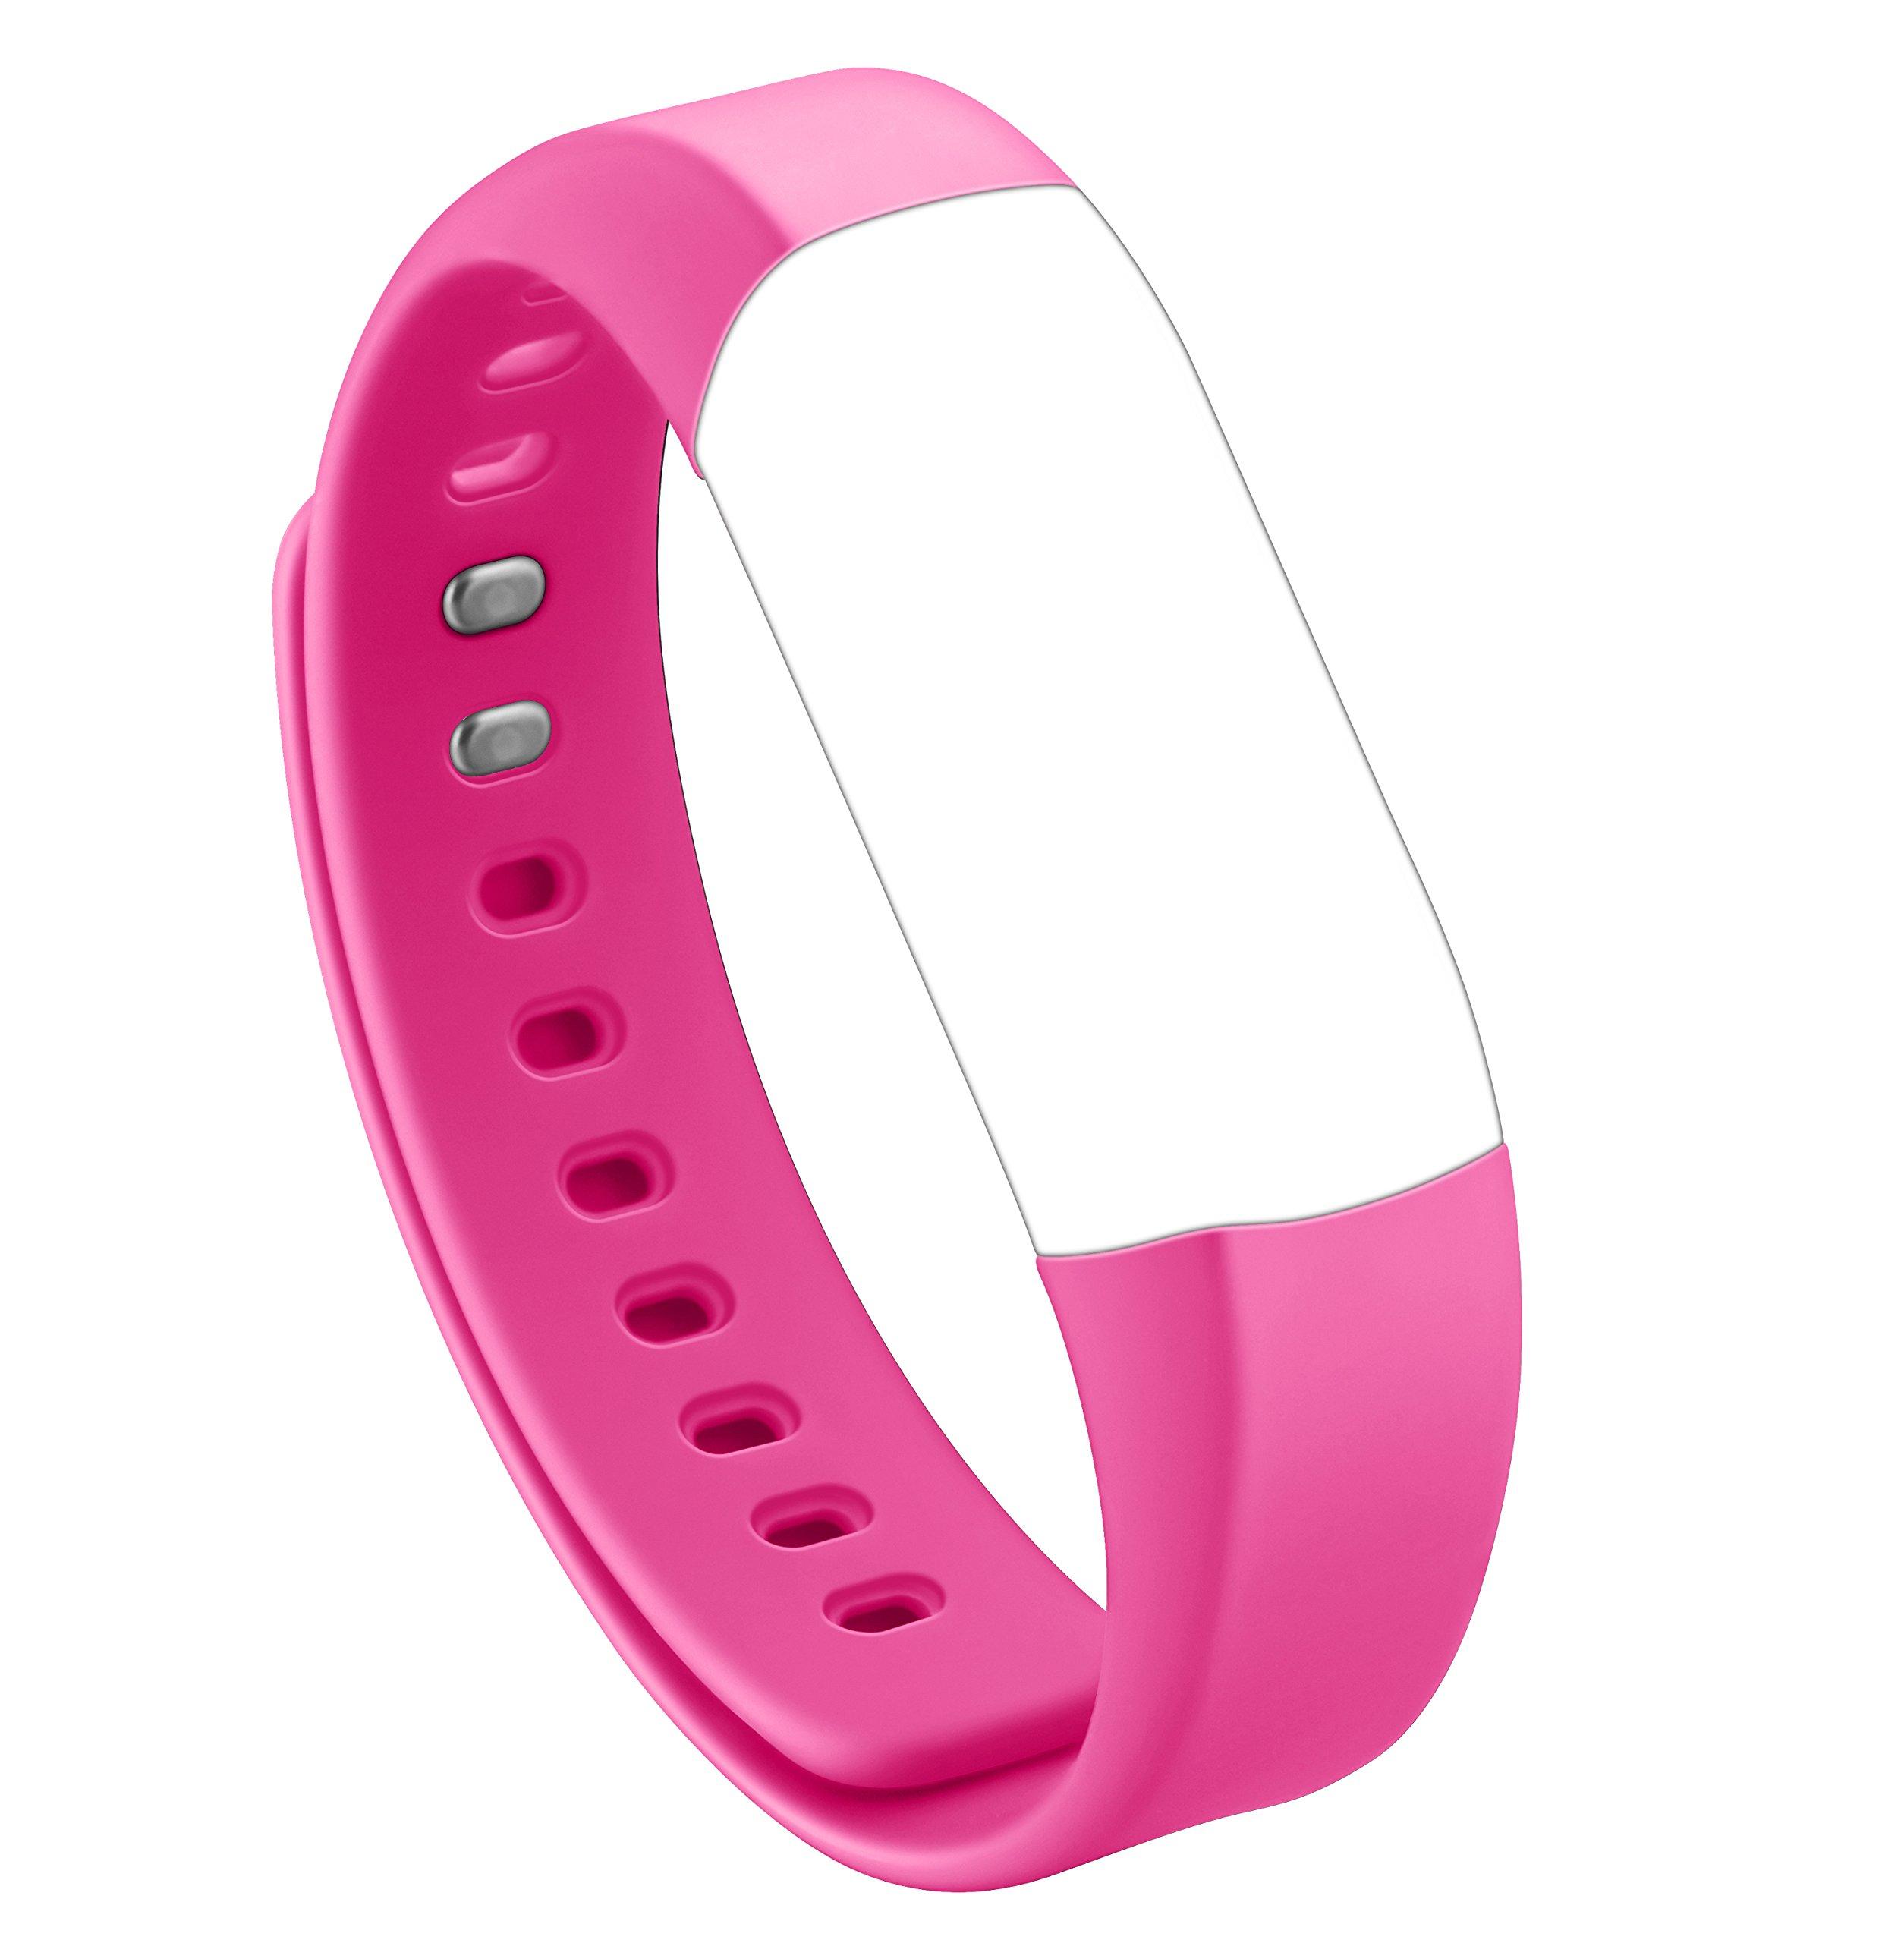 Muzili Fitness Tracker Vigorun4 Activity Tracker Impermeable Sport Smart Watch Pedómetro con Monitor de Ritmo cardíaco… 1